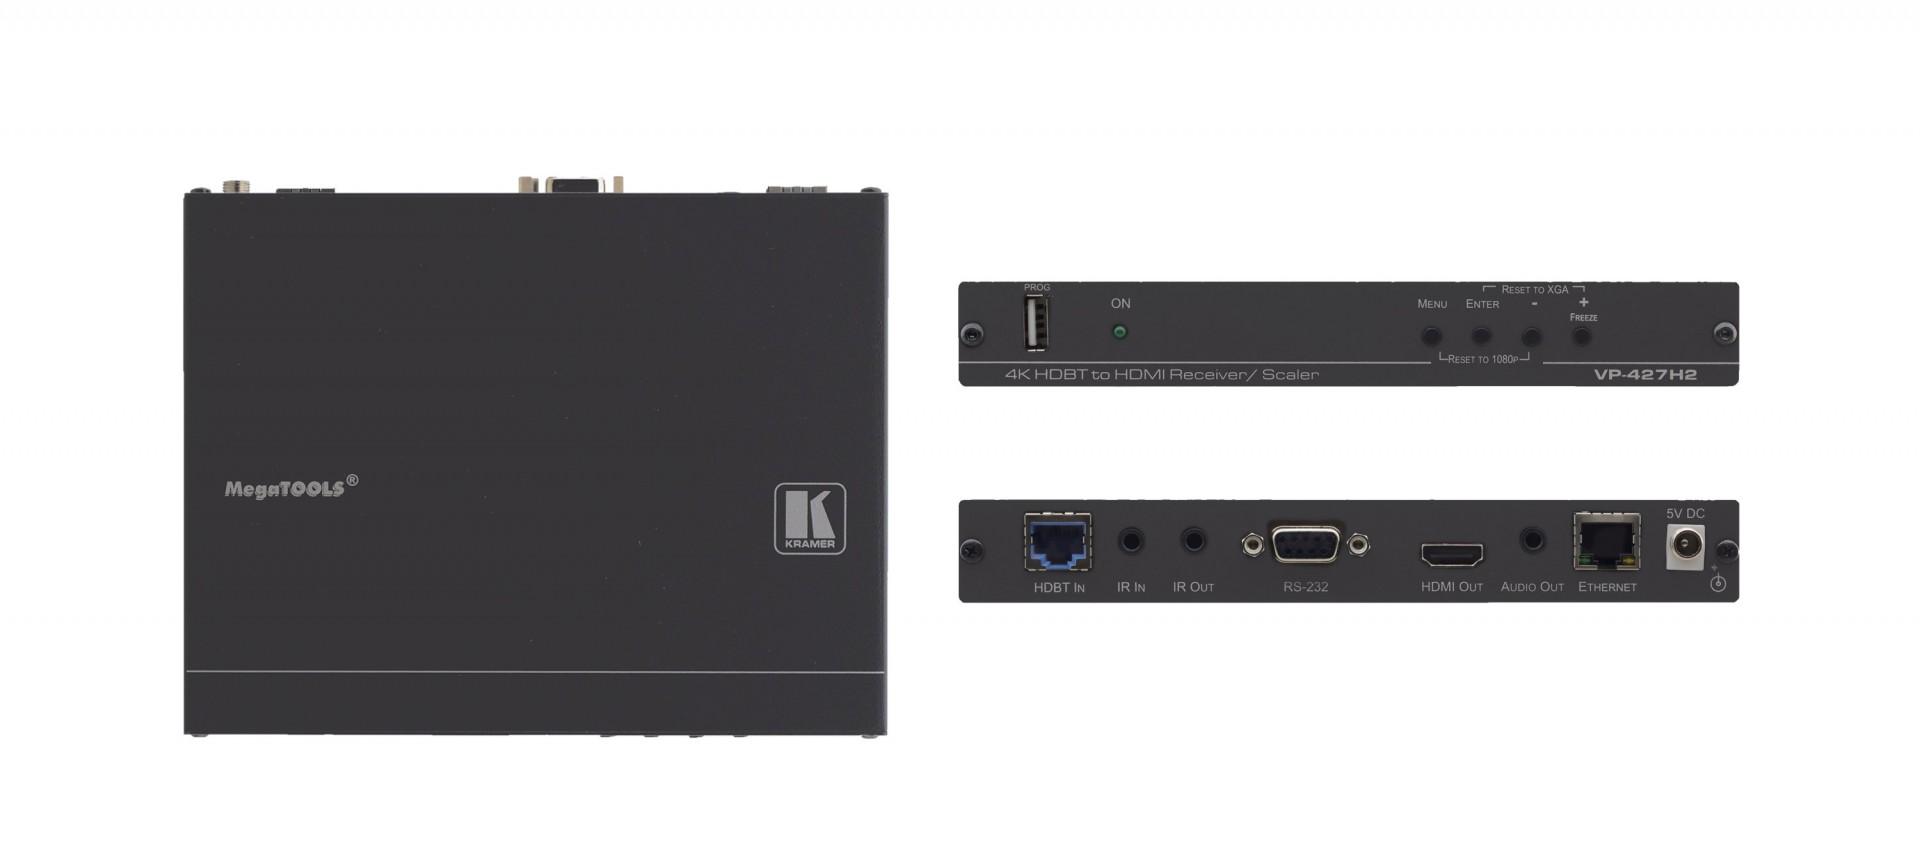 Kramer VP-427H2 4K60 4:4:4 HDMI HDCP 2.2 Receiver/Scaler over Extended–Reach HDBaseT